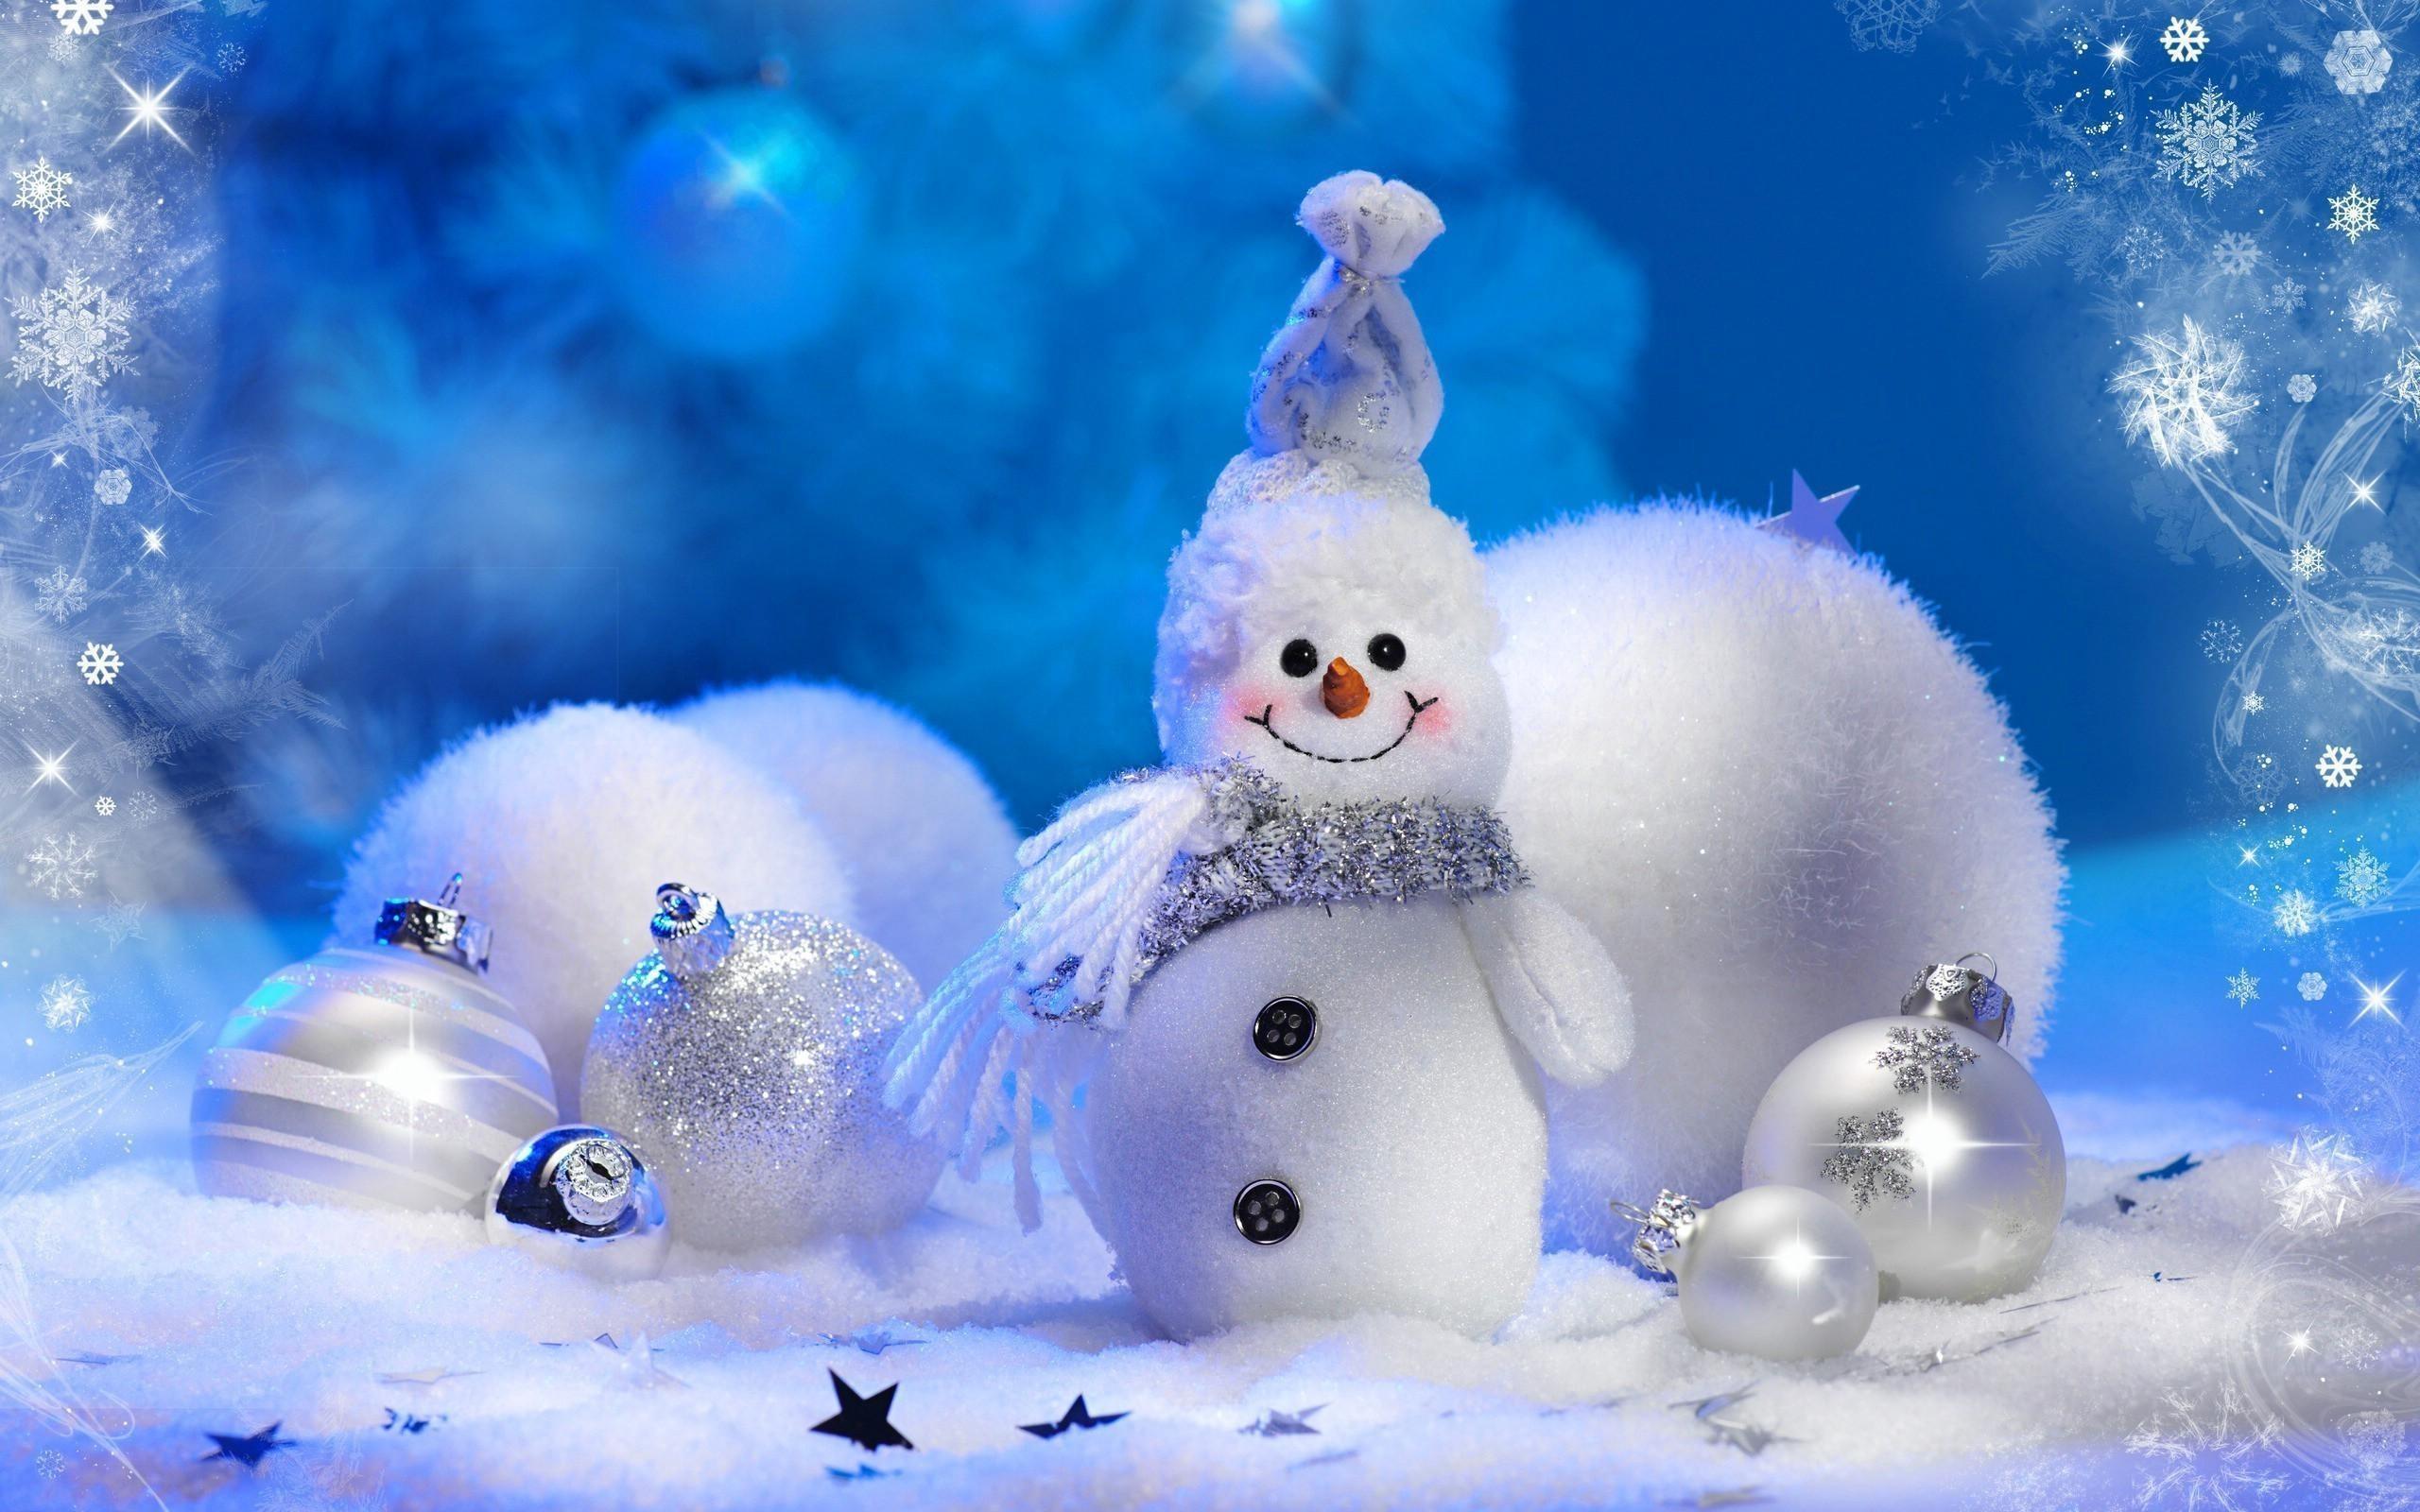 Res: 2560x1600, Download Original Wallpaper Category:holidays ...